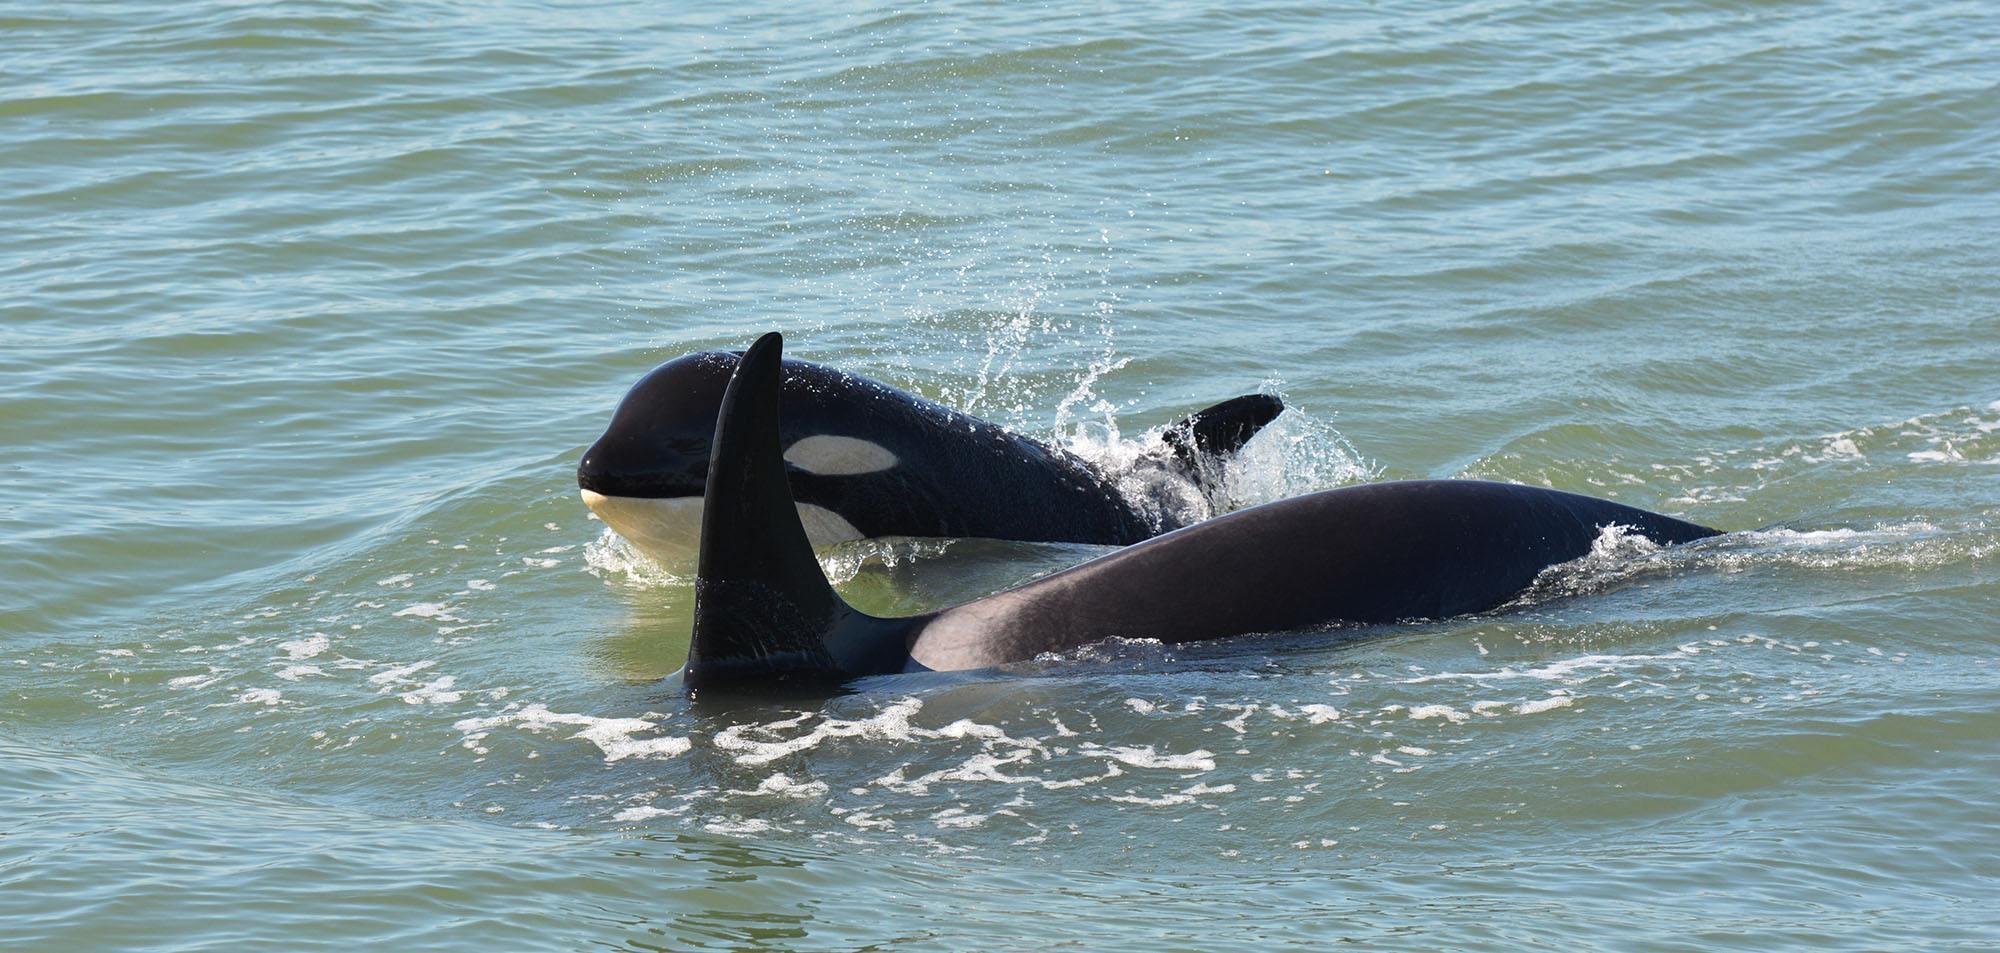 Orca calf Scarlett (J50) with Slick (J16). Photo by Capt. Gary Sutton, Steveston Seabreeze Adventures, Richmond, BC.